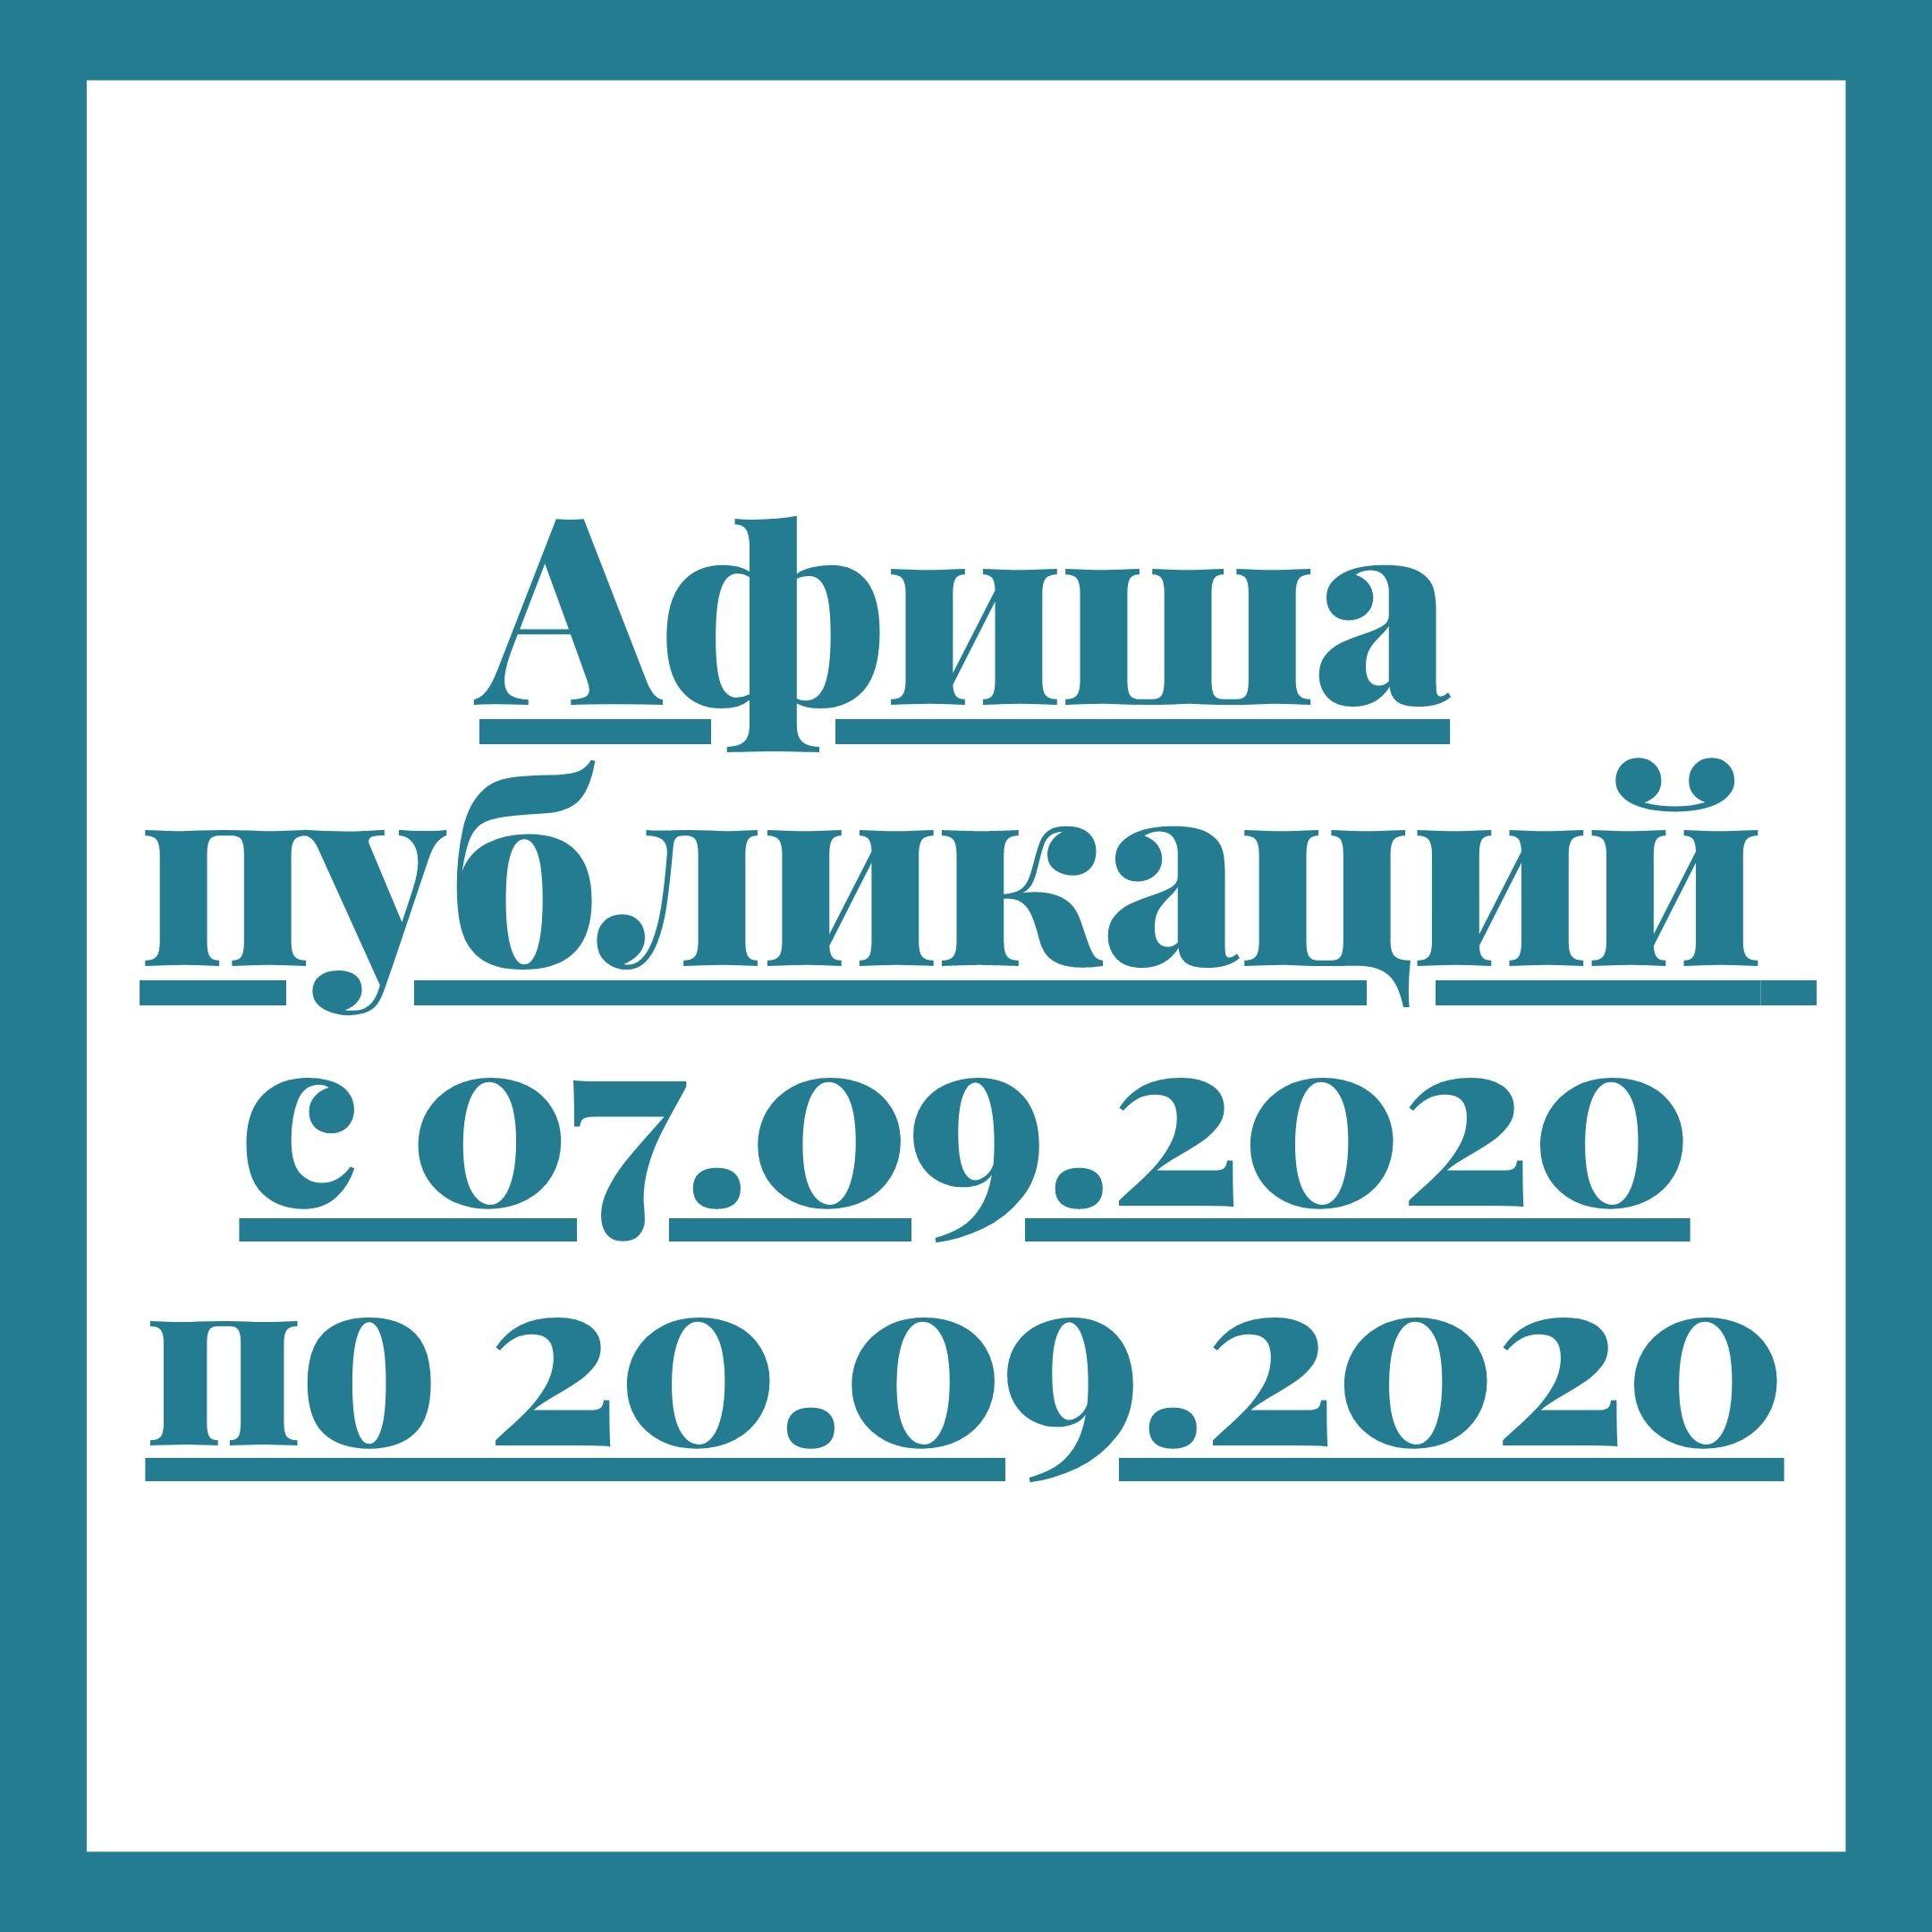 Афиша публикаций с 07.09.2020 по 20.09.2020